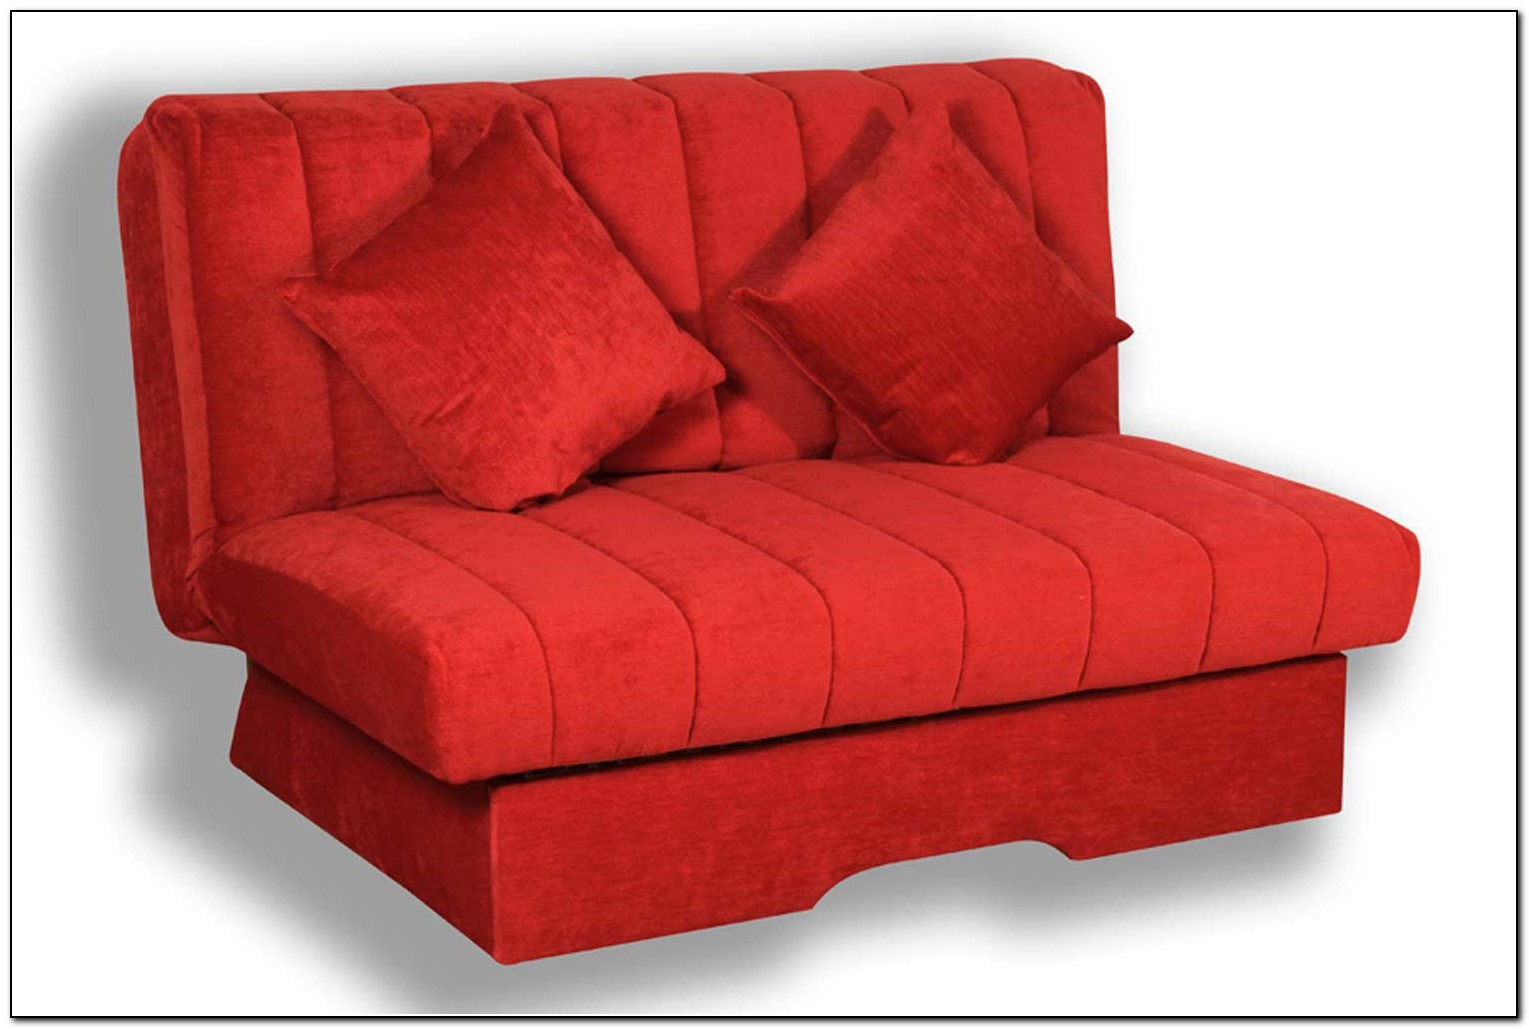 Cheap Sofa Beds Uk Under 194 163 100 Sofa Home Design Ideas